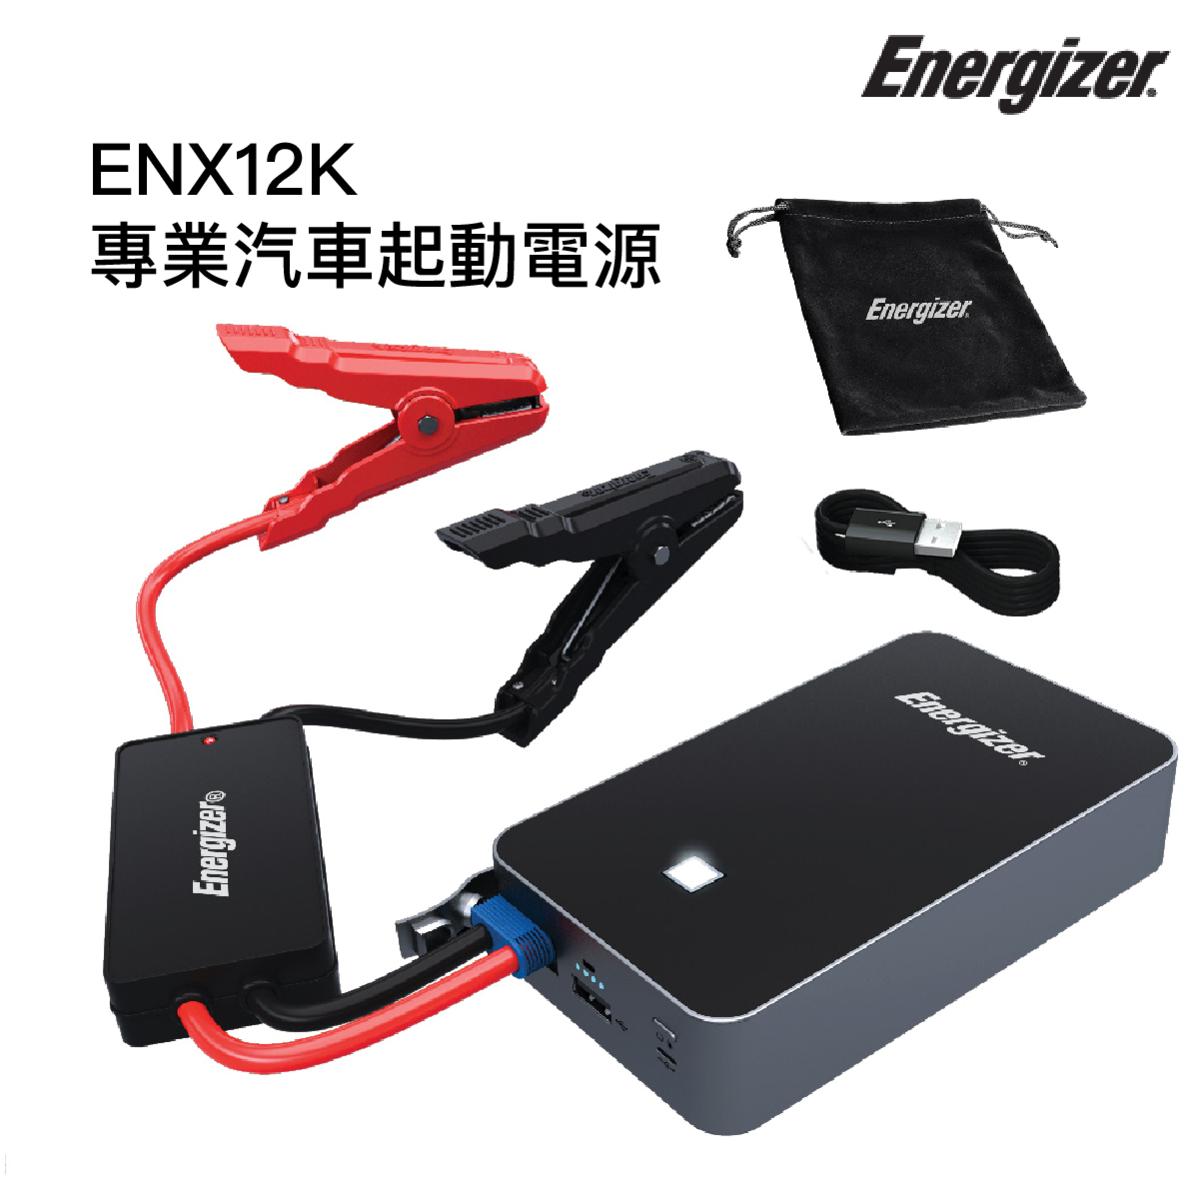 專業汽車起動電源 11100mAh Jump Starter ENX12K